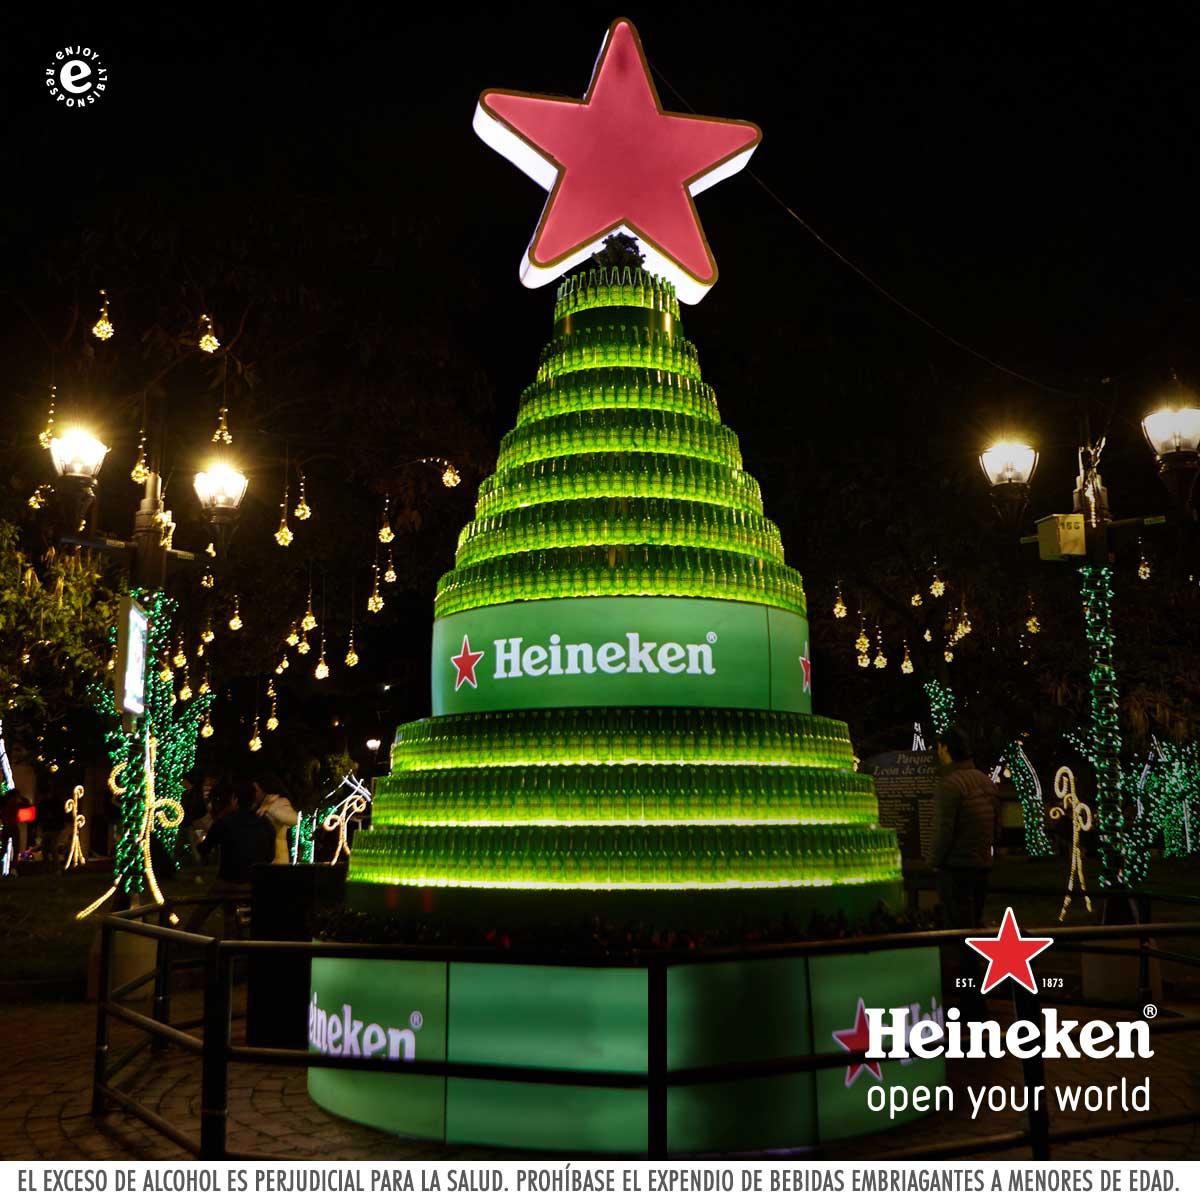 Heineken Feliz Navidad.Heineken Colombia On Twitter La Mejor Forma De Iniciar La